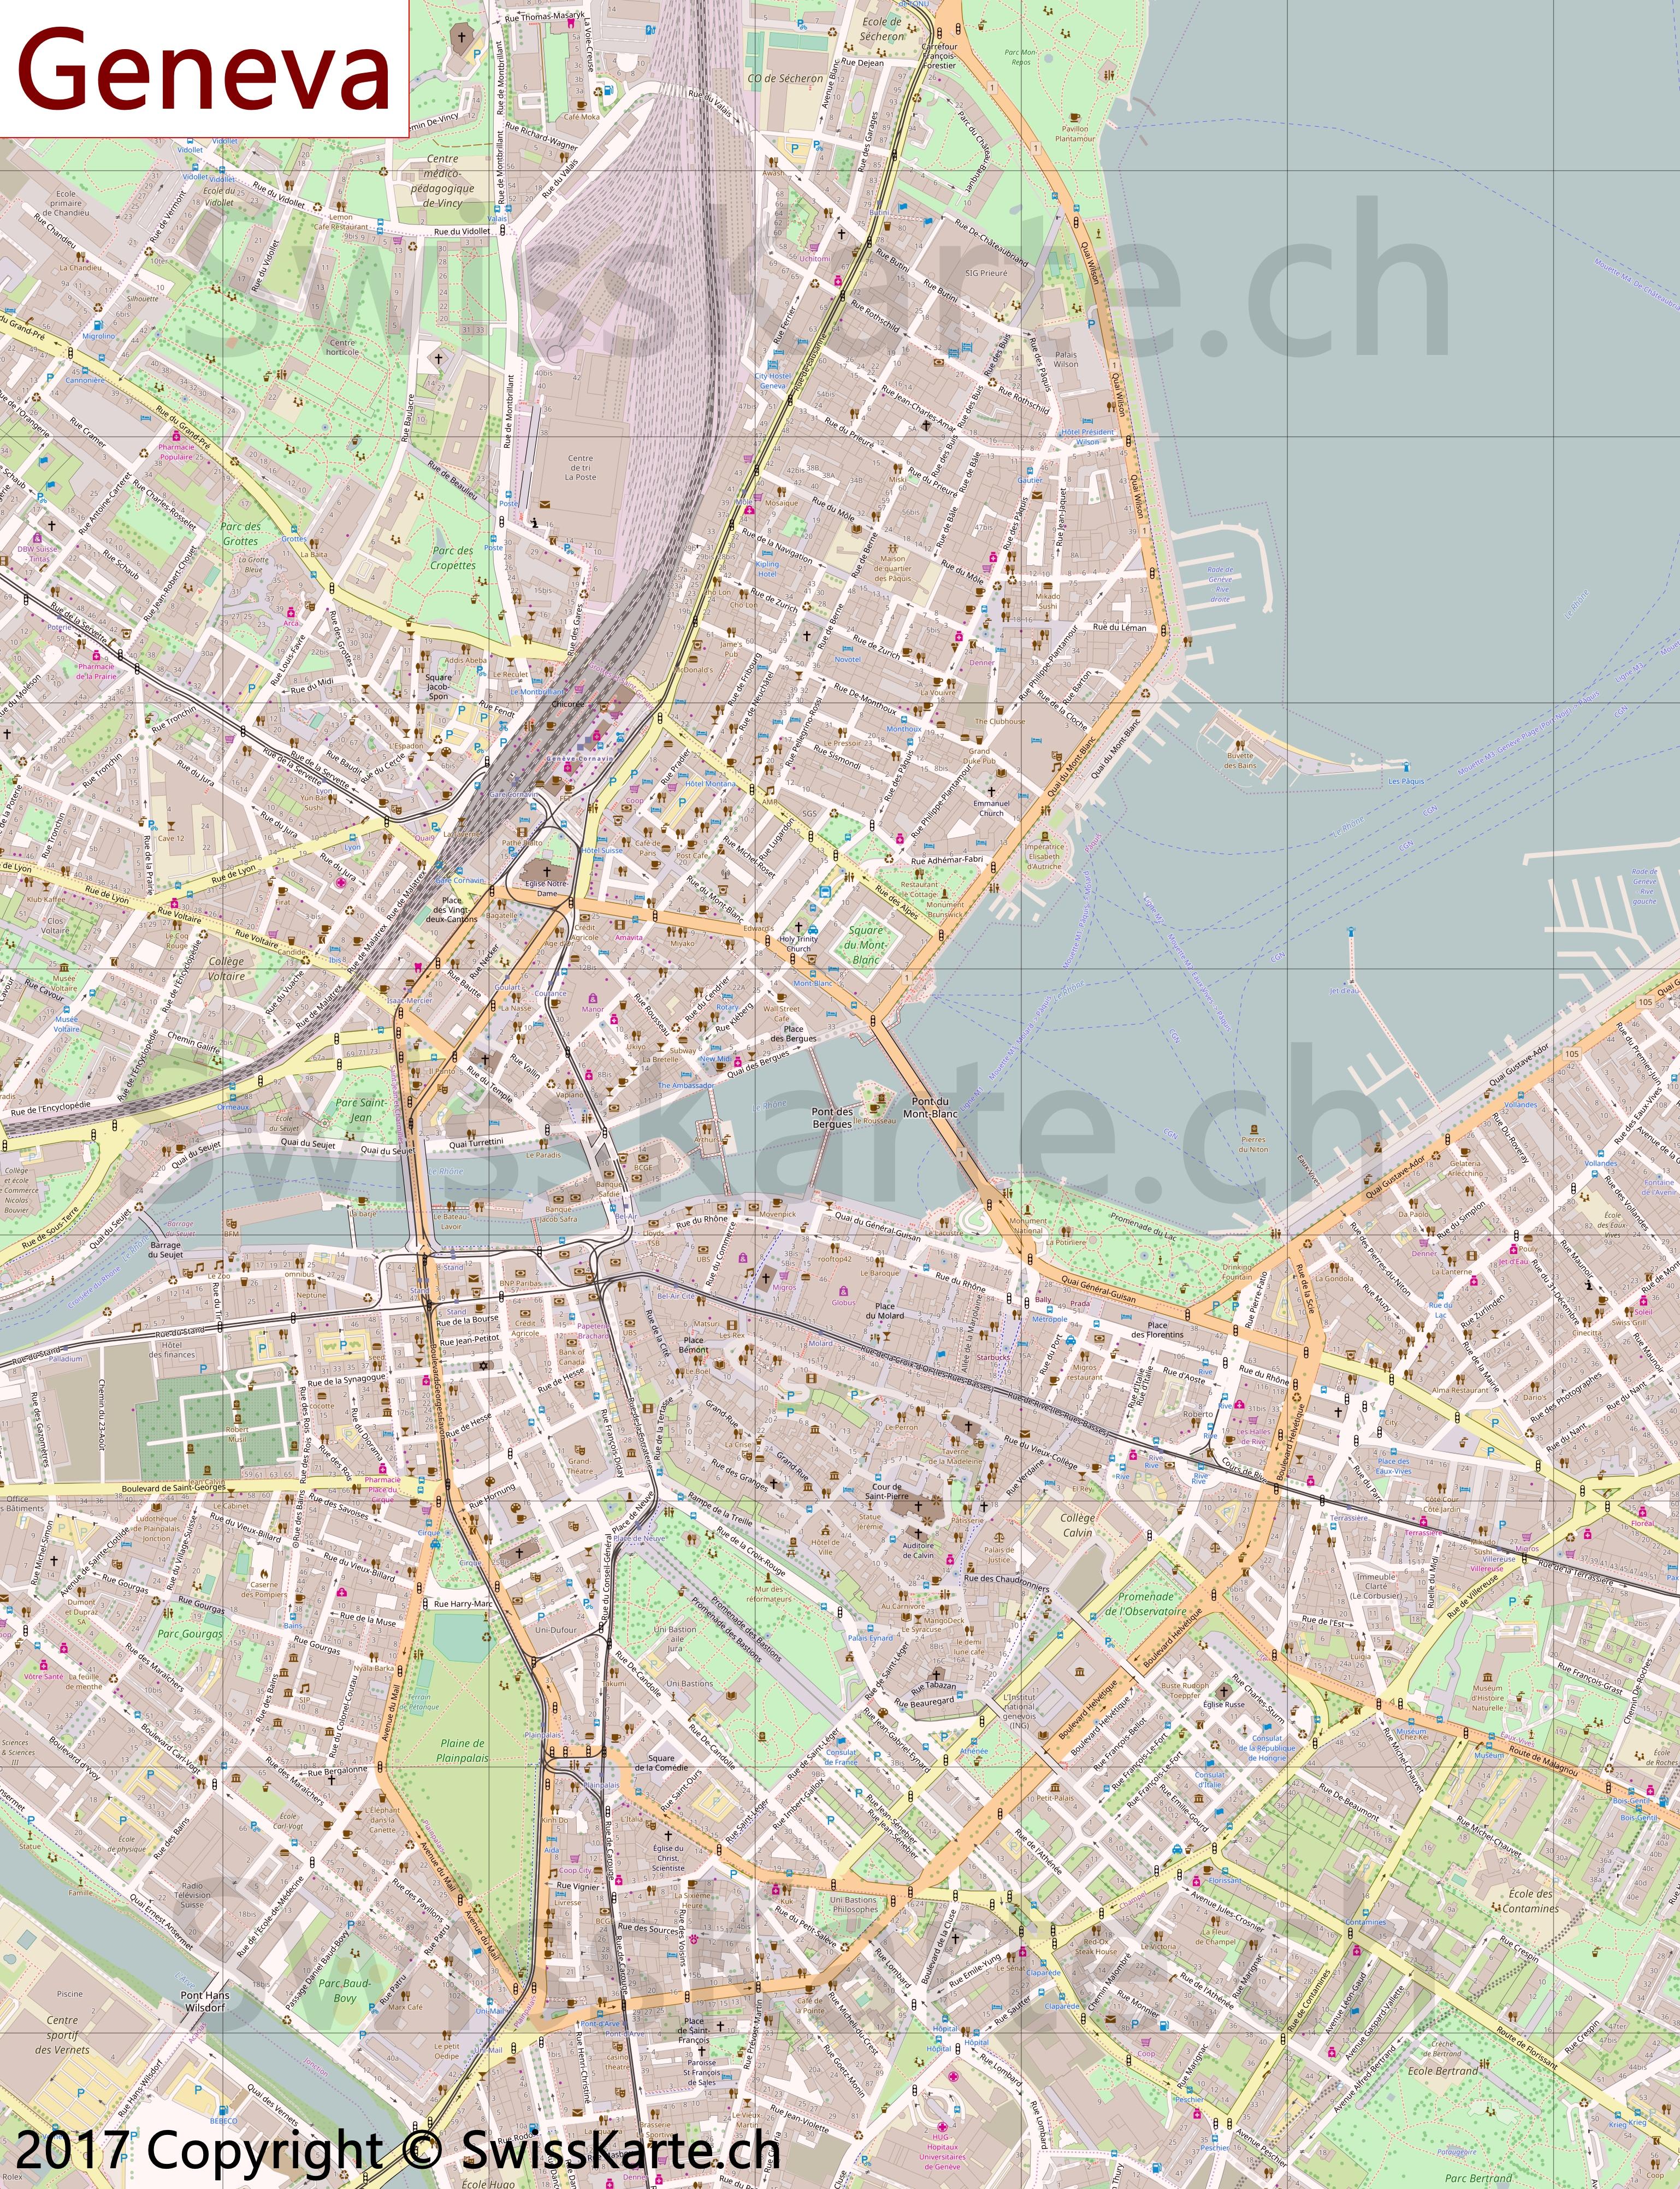 Map of Geneva - SwissKarte.ch